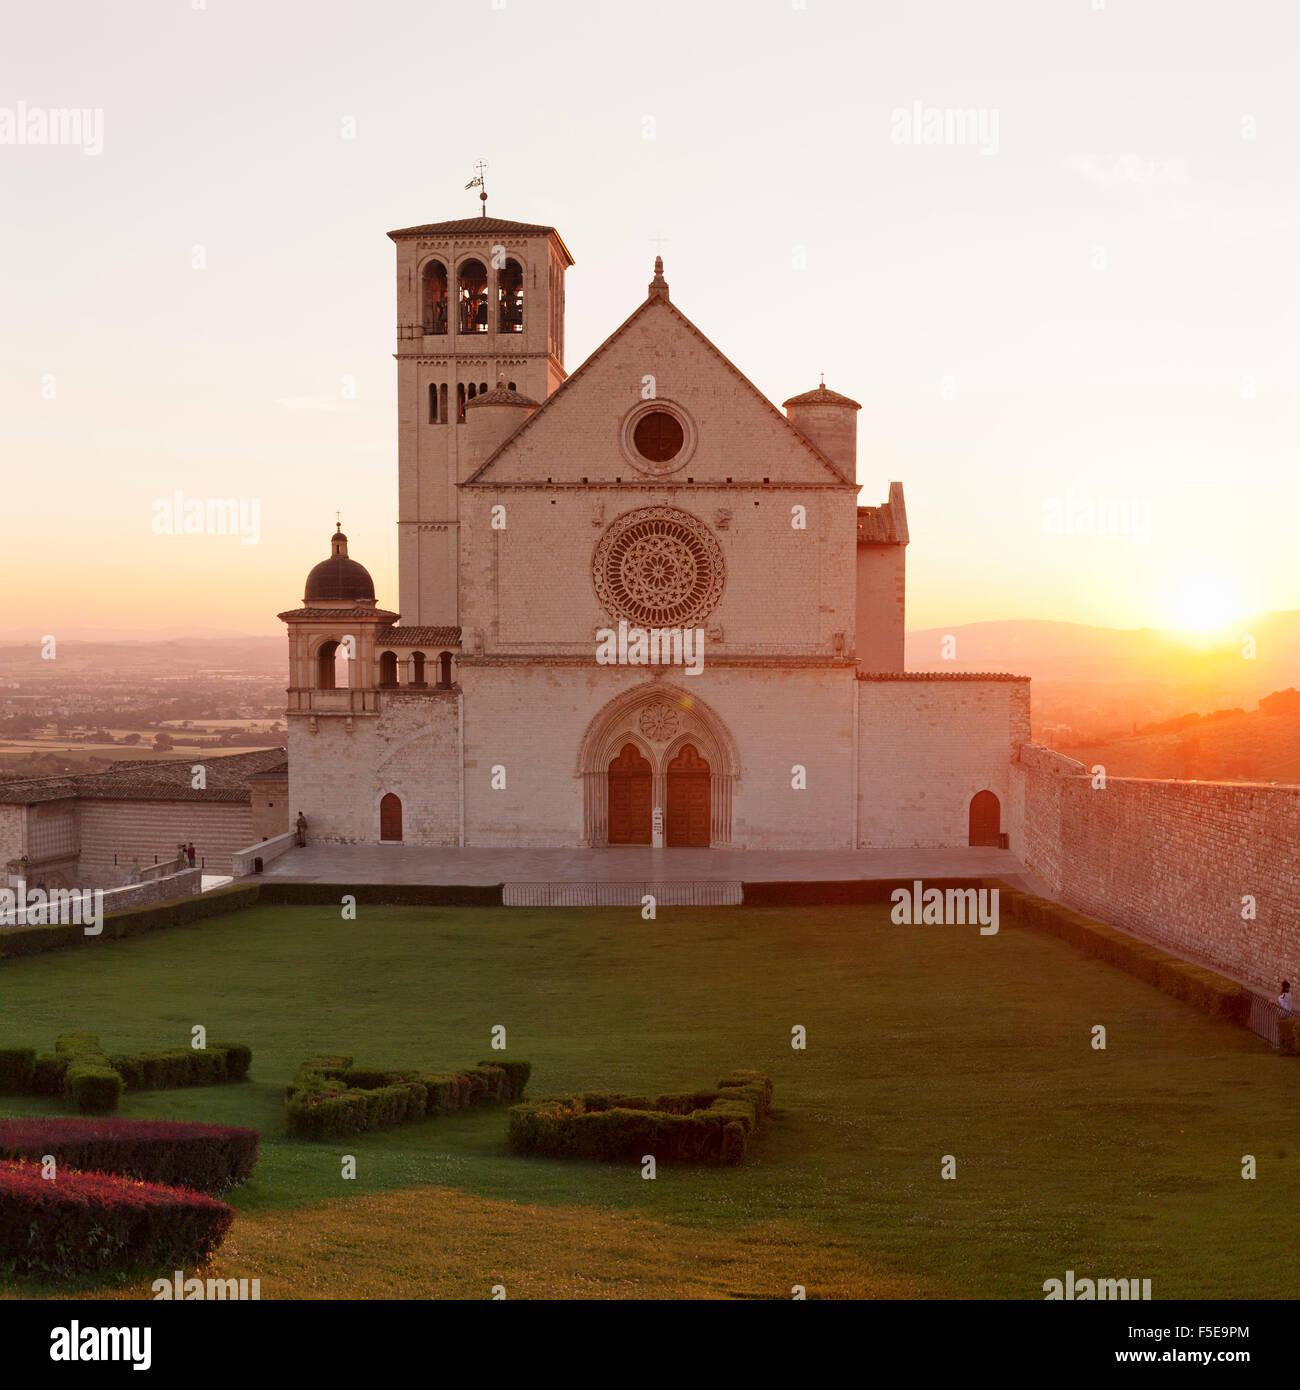 Basilica of San Francesco, UNESCO World Heritage Site, Assisi, Perugia District, Umbria, Italy, Europe Stock Photo